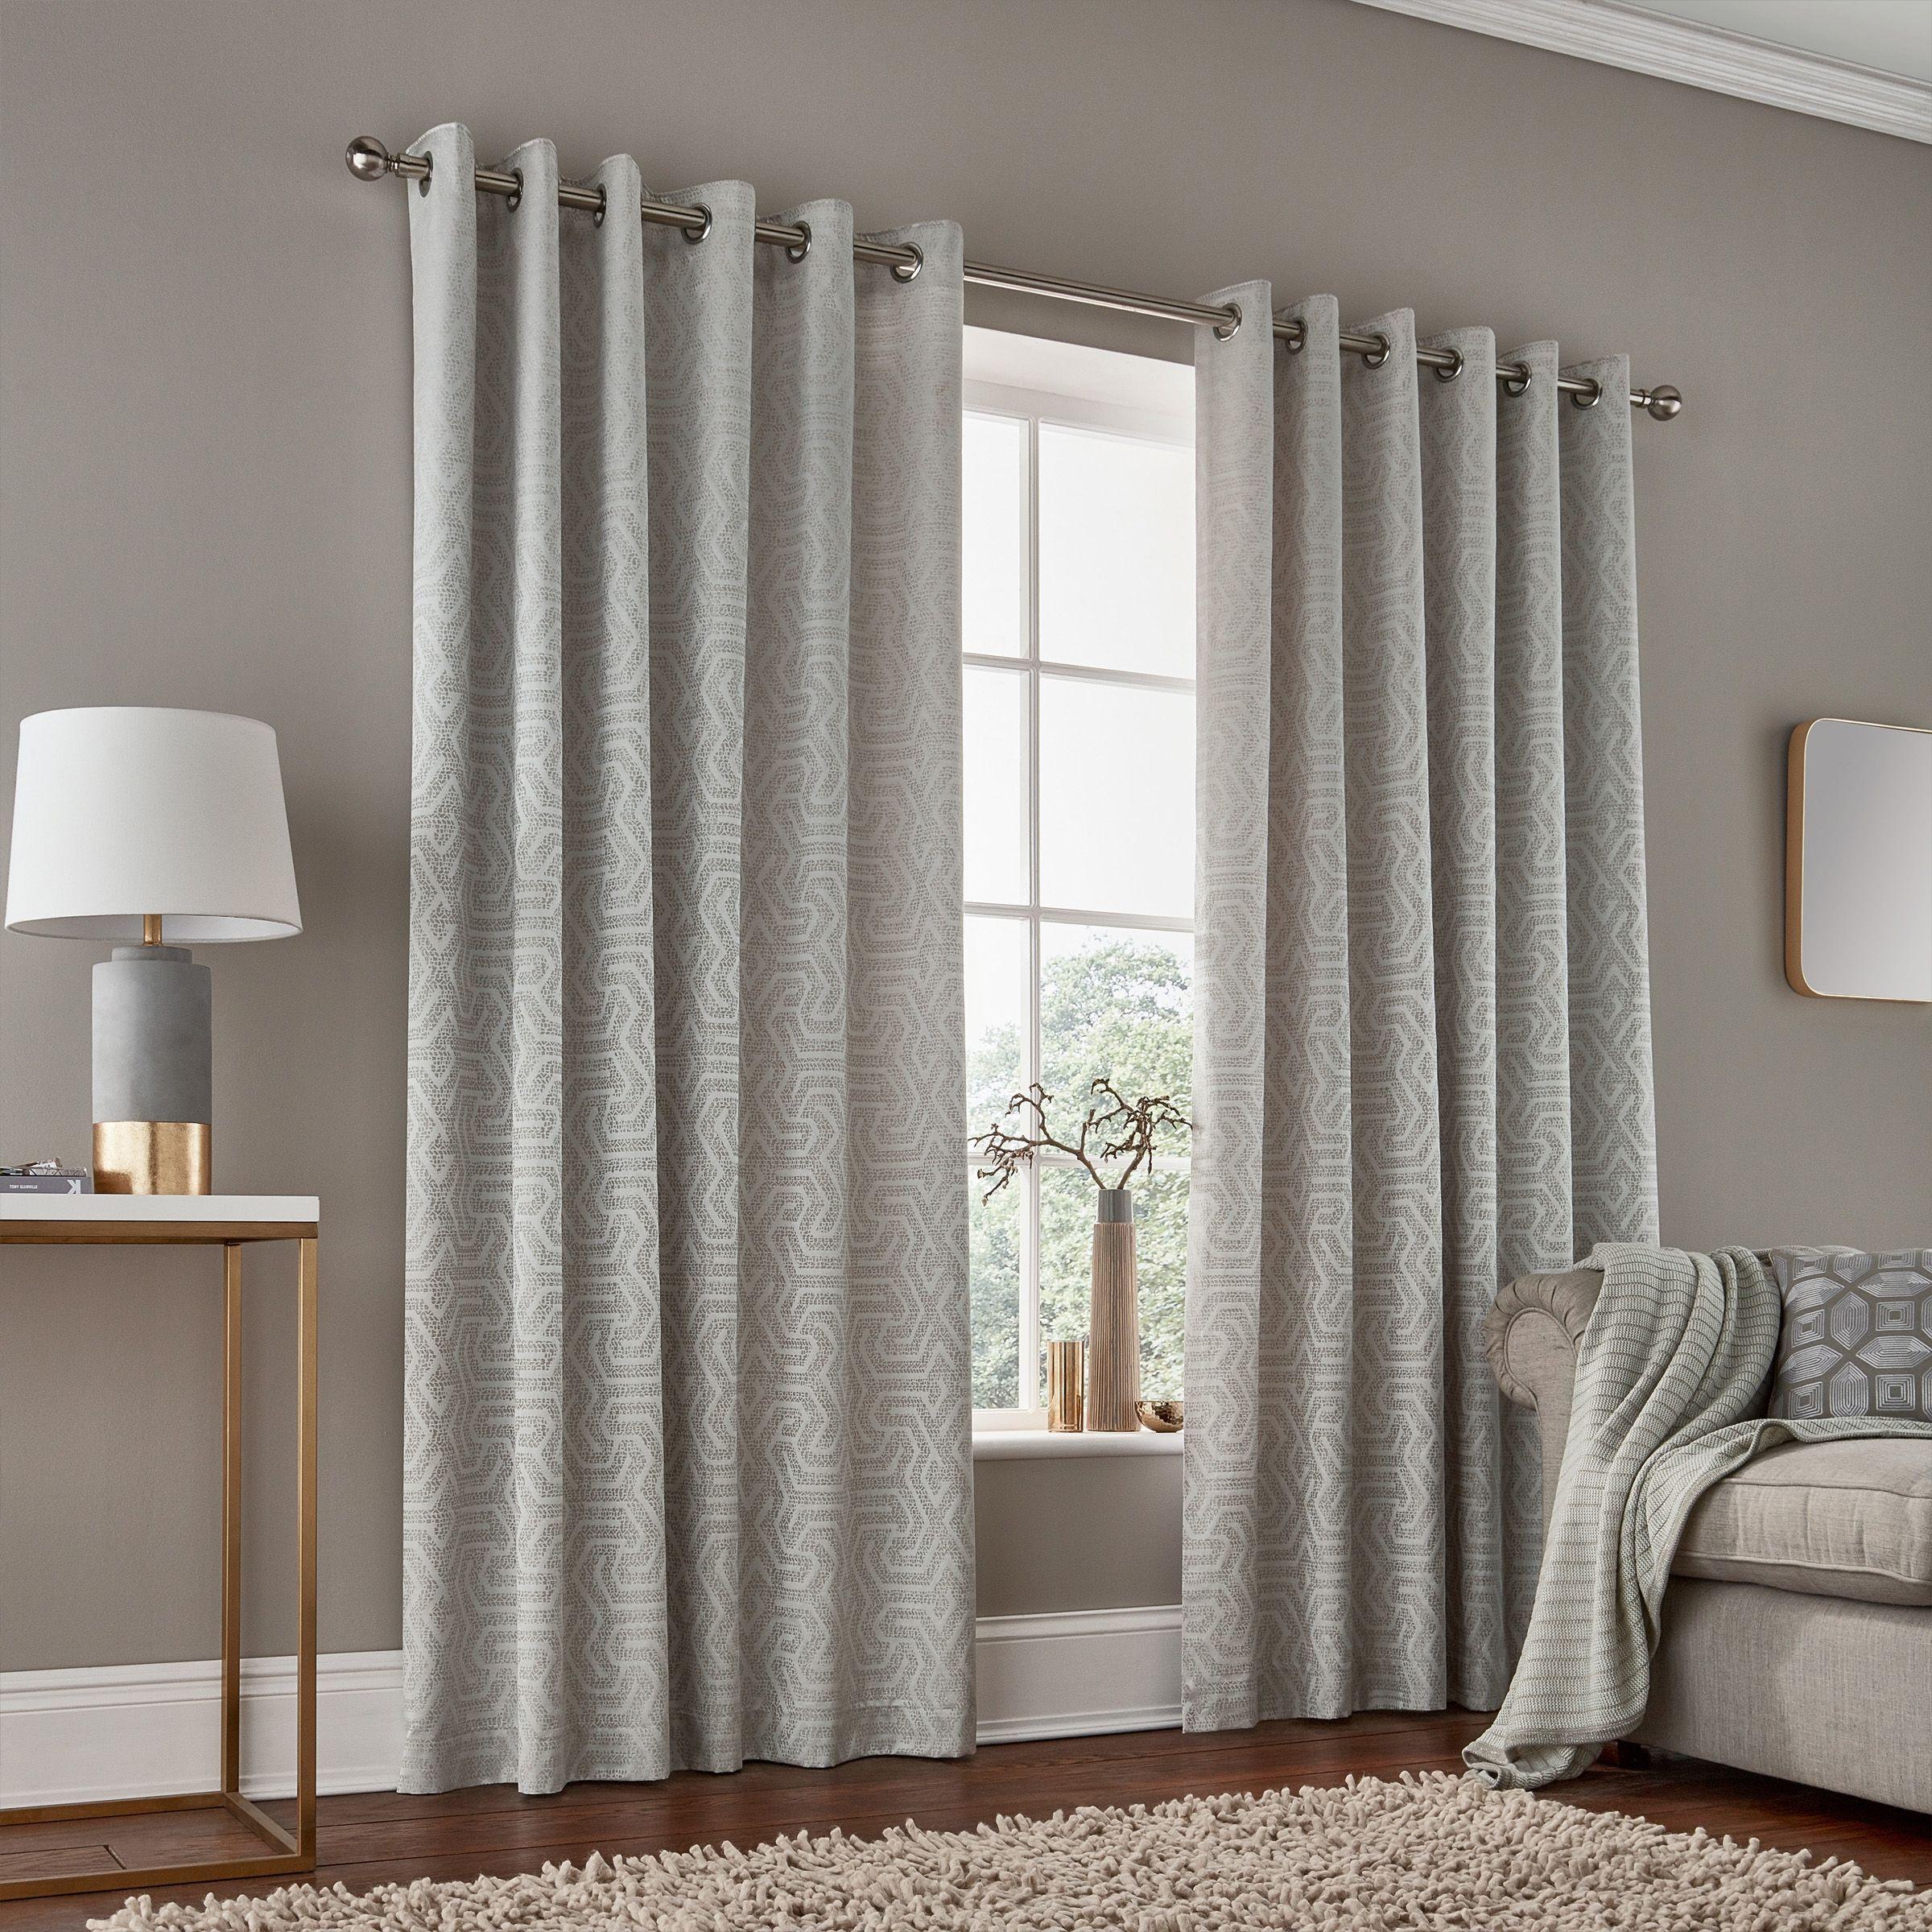 Curtain Rod Supply & Install